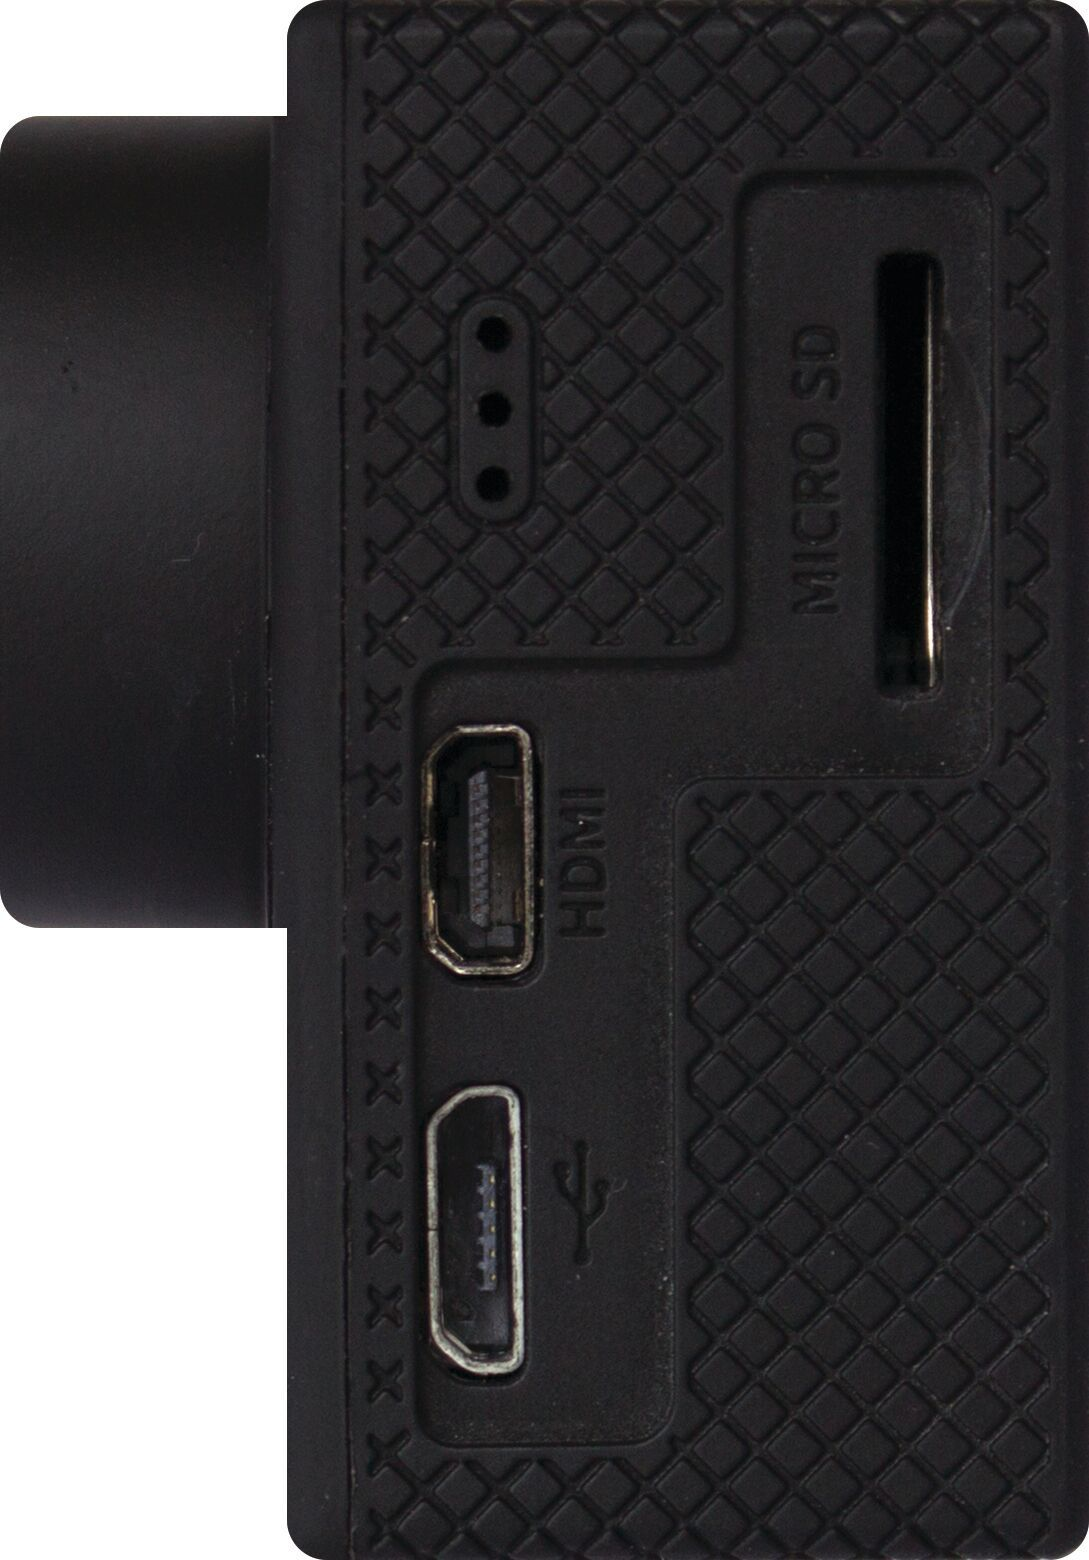 3SIXT: Action Camera Full HD 1080P image